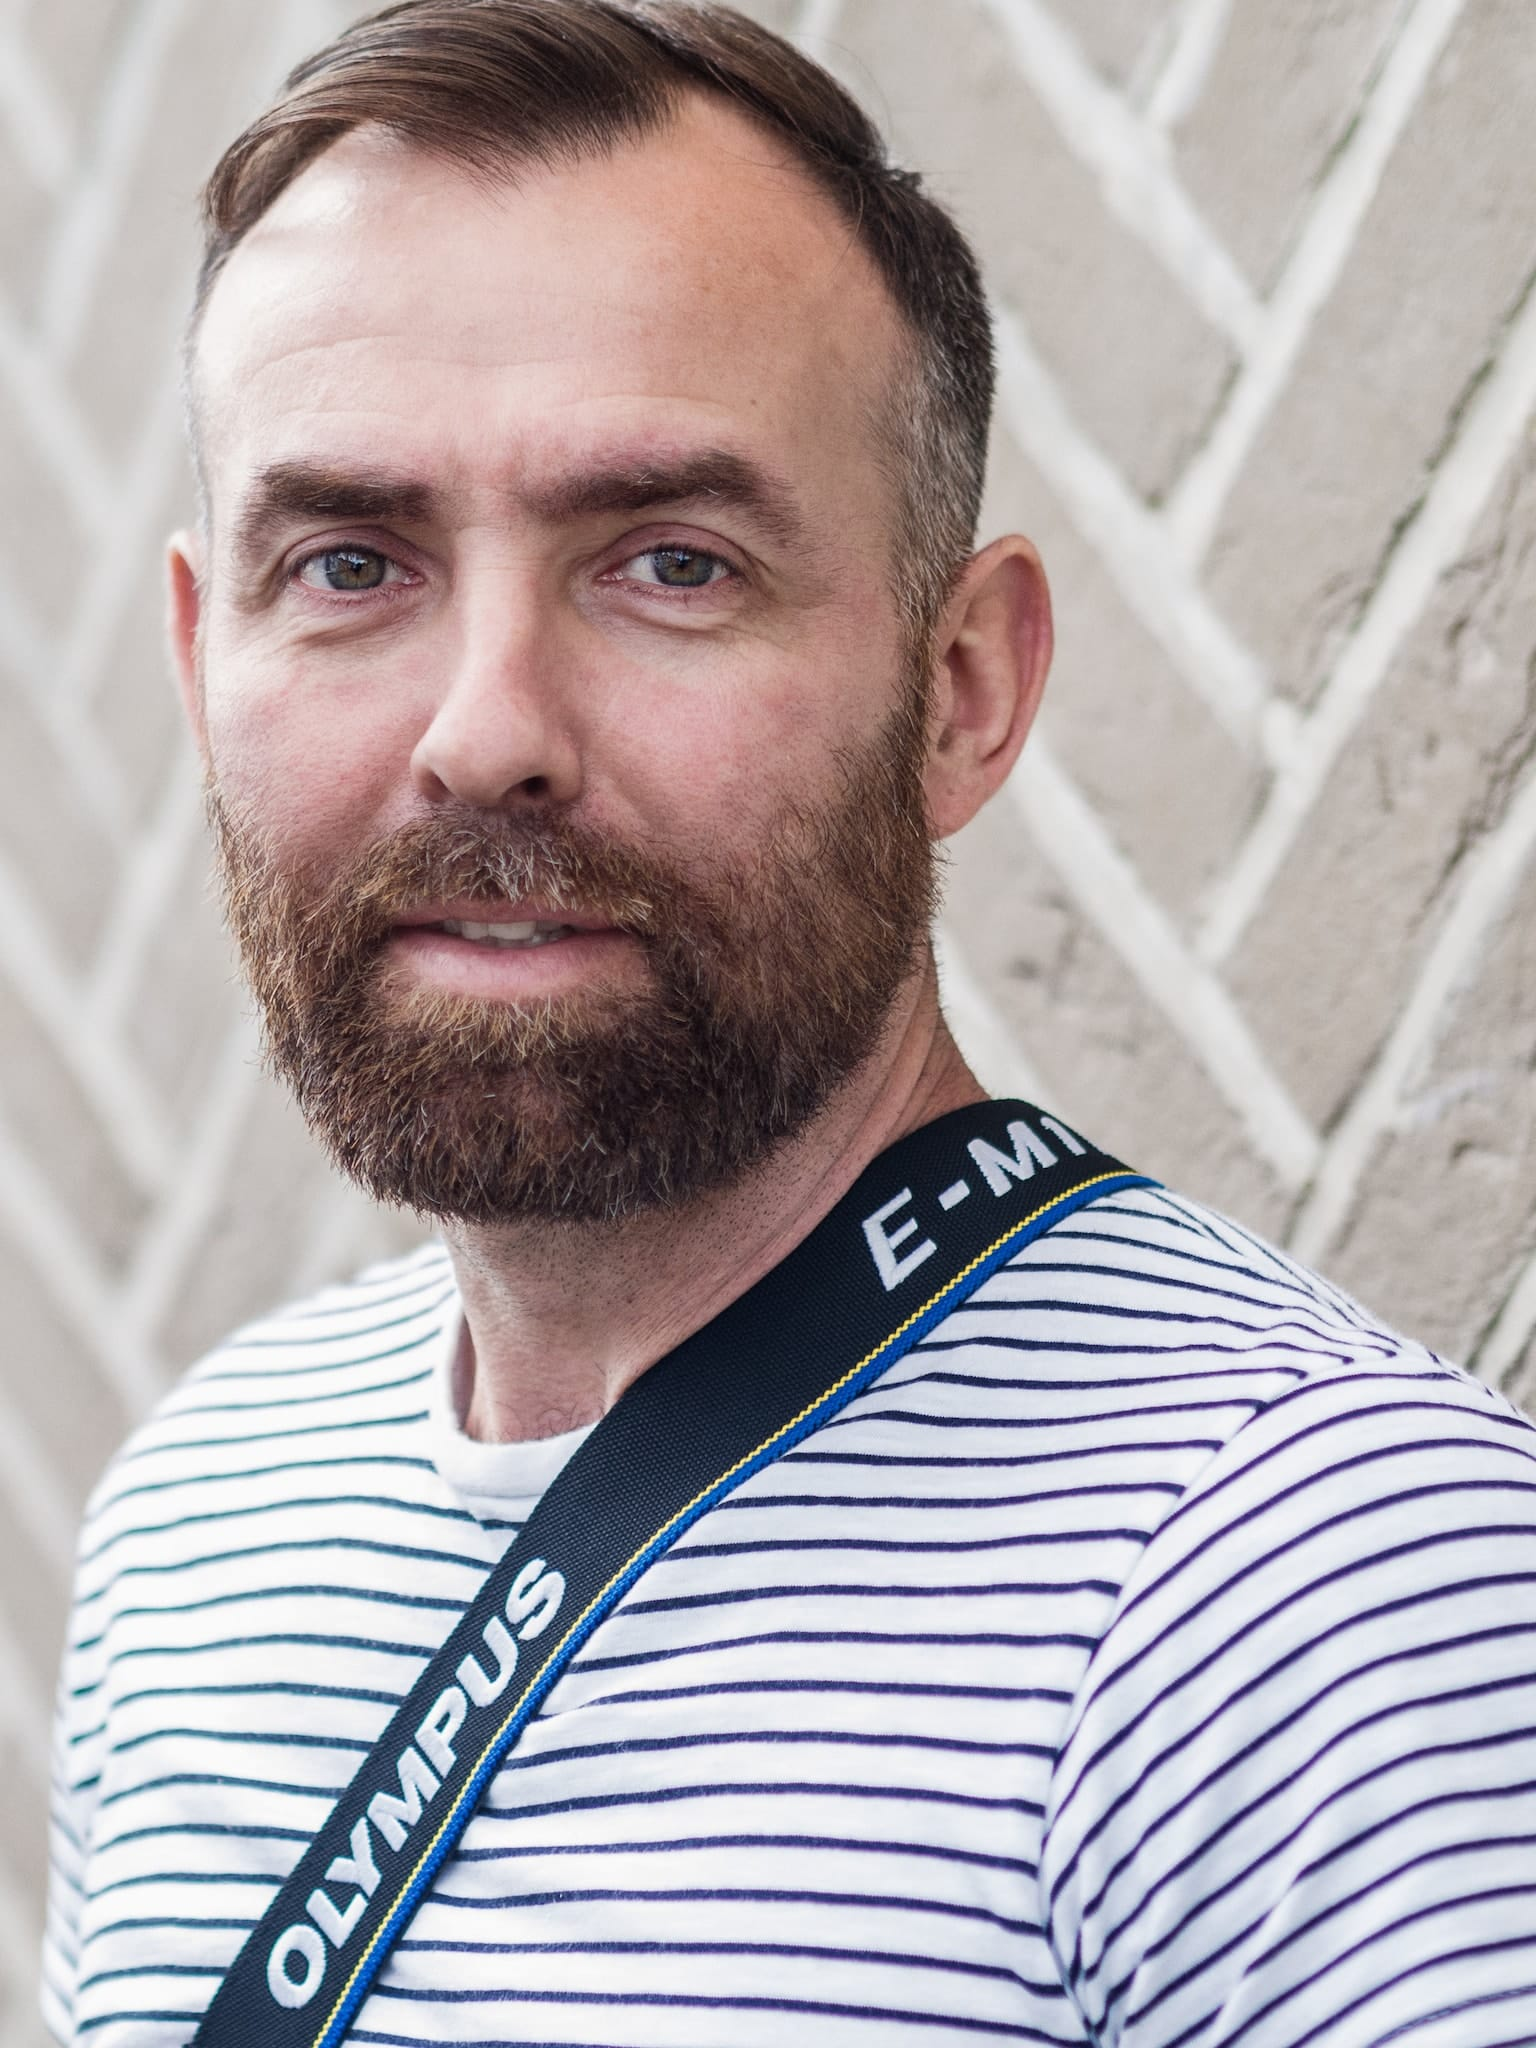 Craig Reilly - Street Photographer